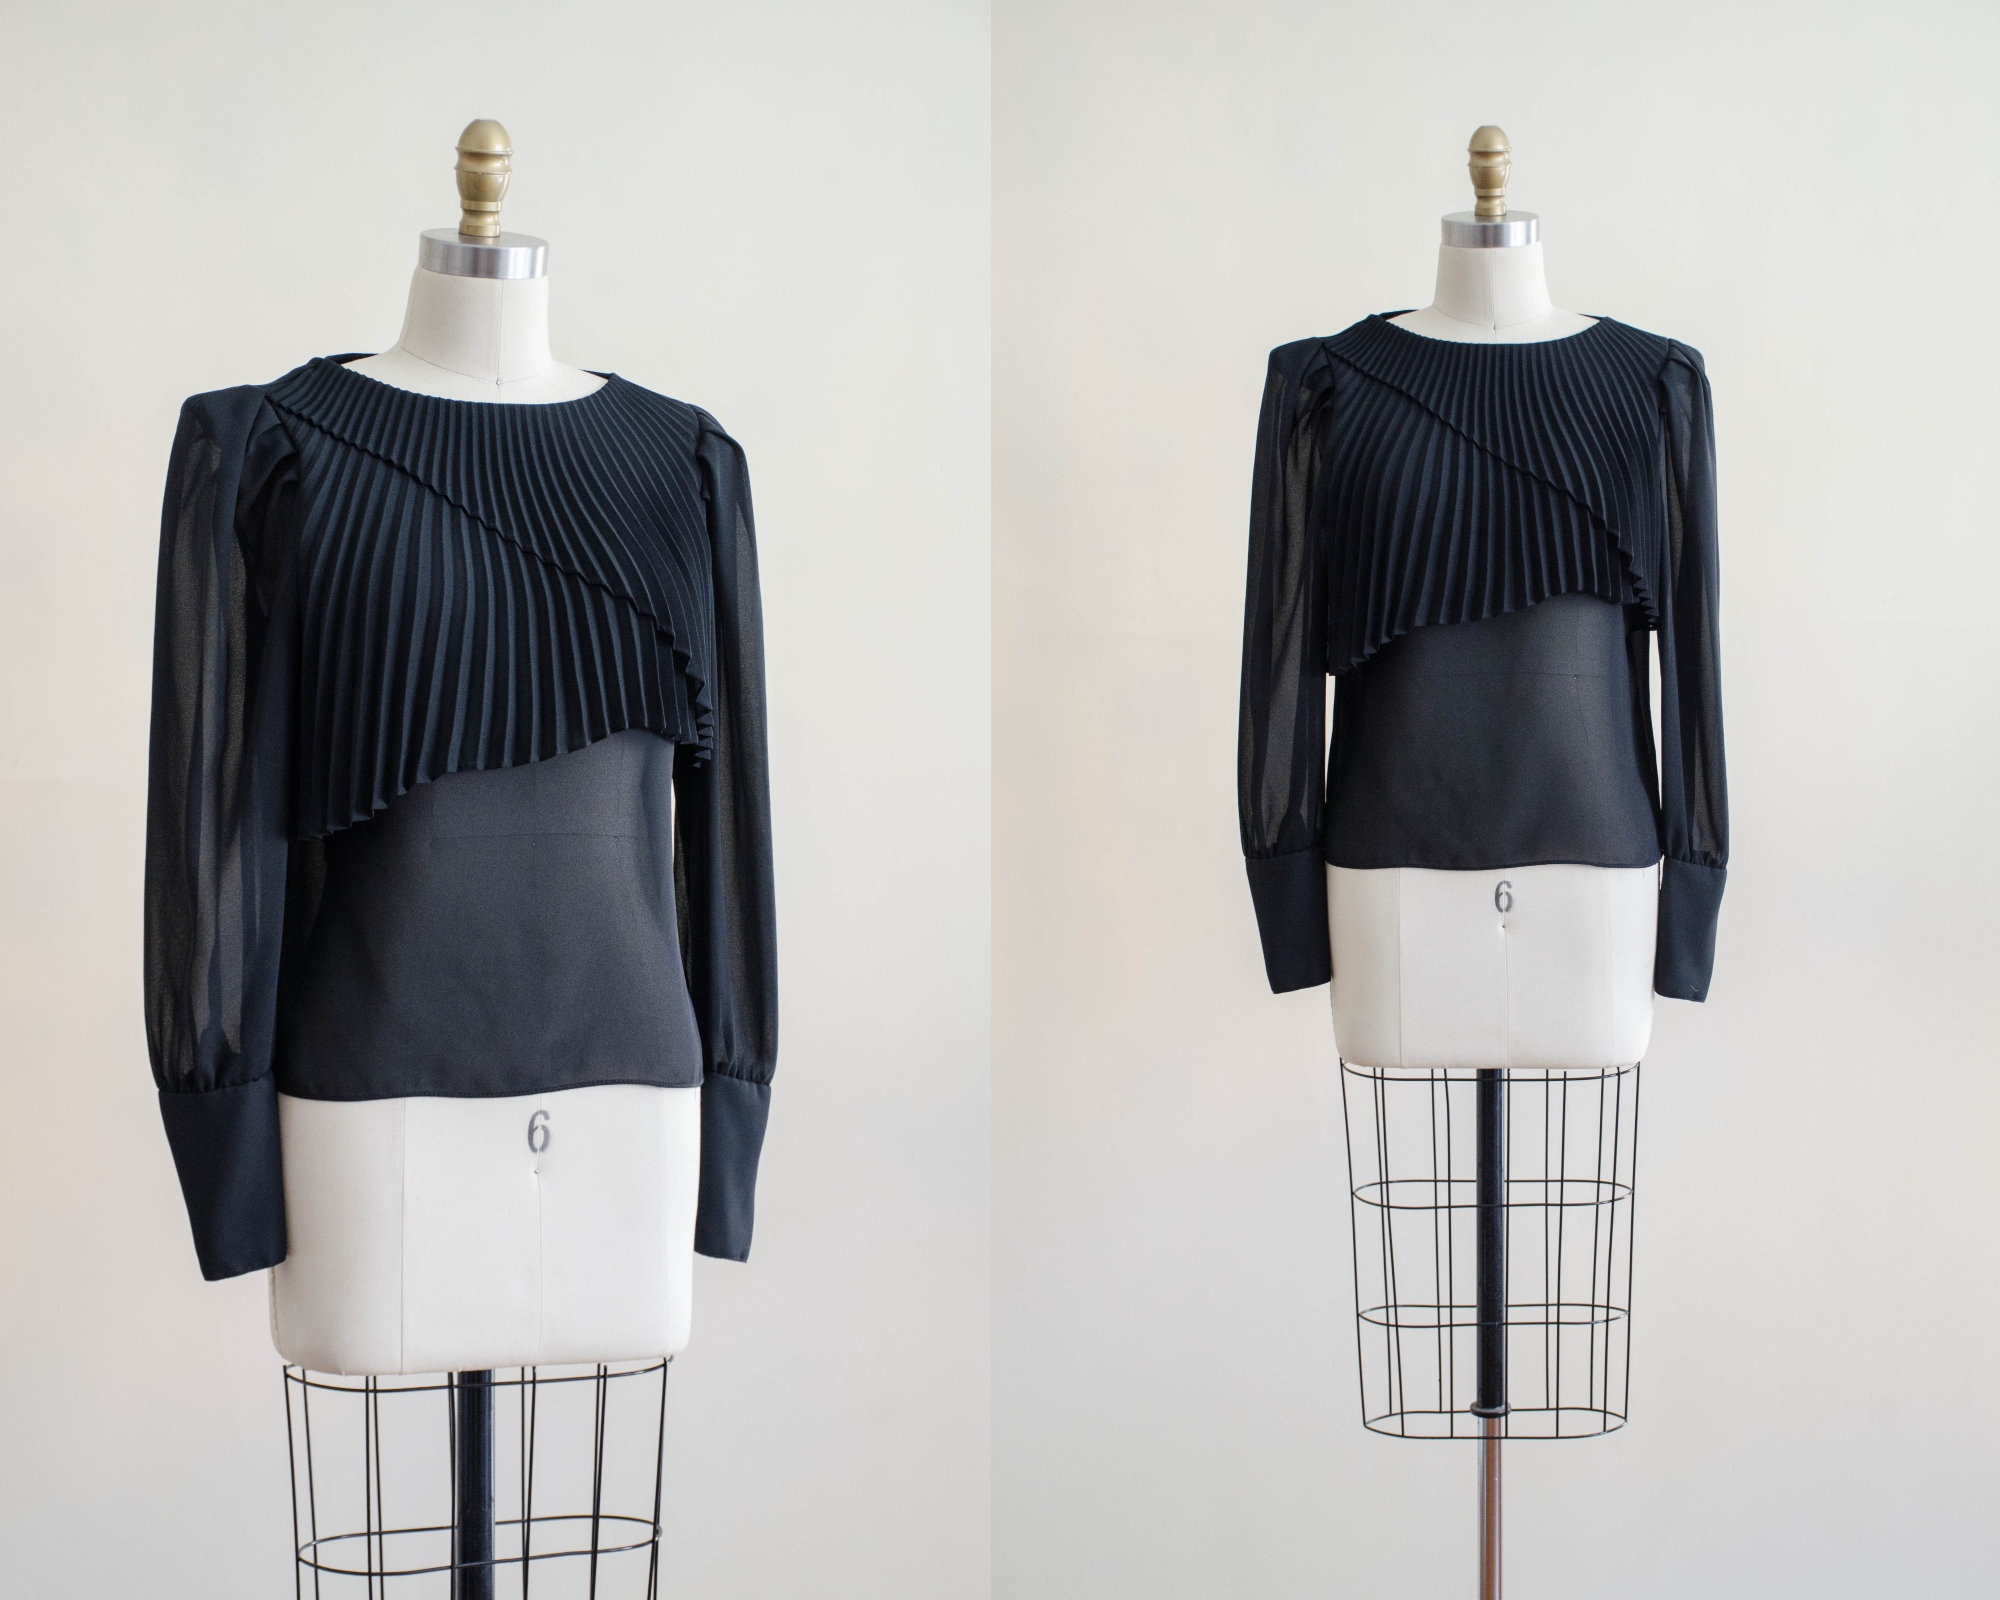 80s Tops, Shirts, T-shirts, Blouse   90s T-shirts Sheer Black Vintage Shirt  80S See Through Ruffled Collar Blouse $38.00 AT vintagedancer.com